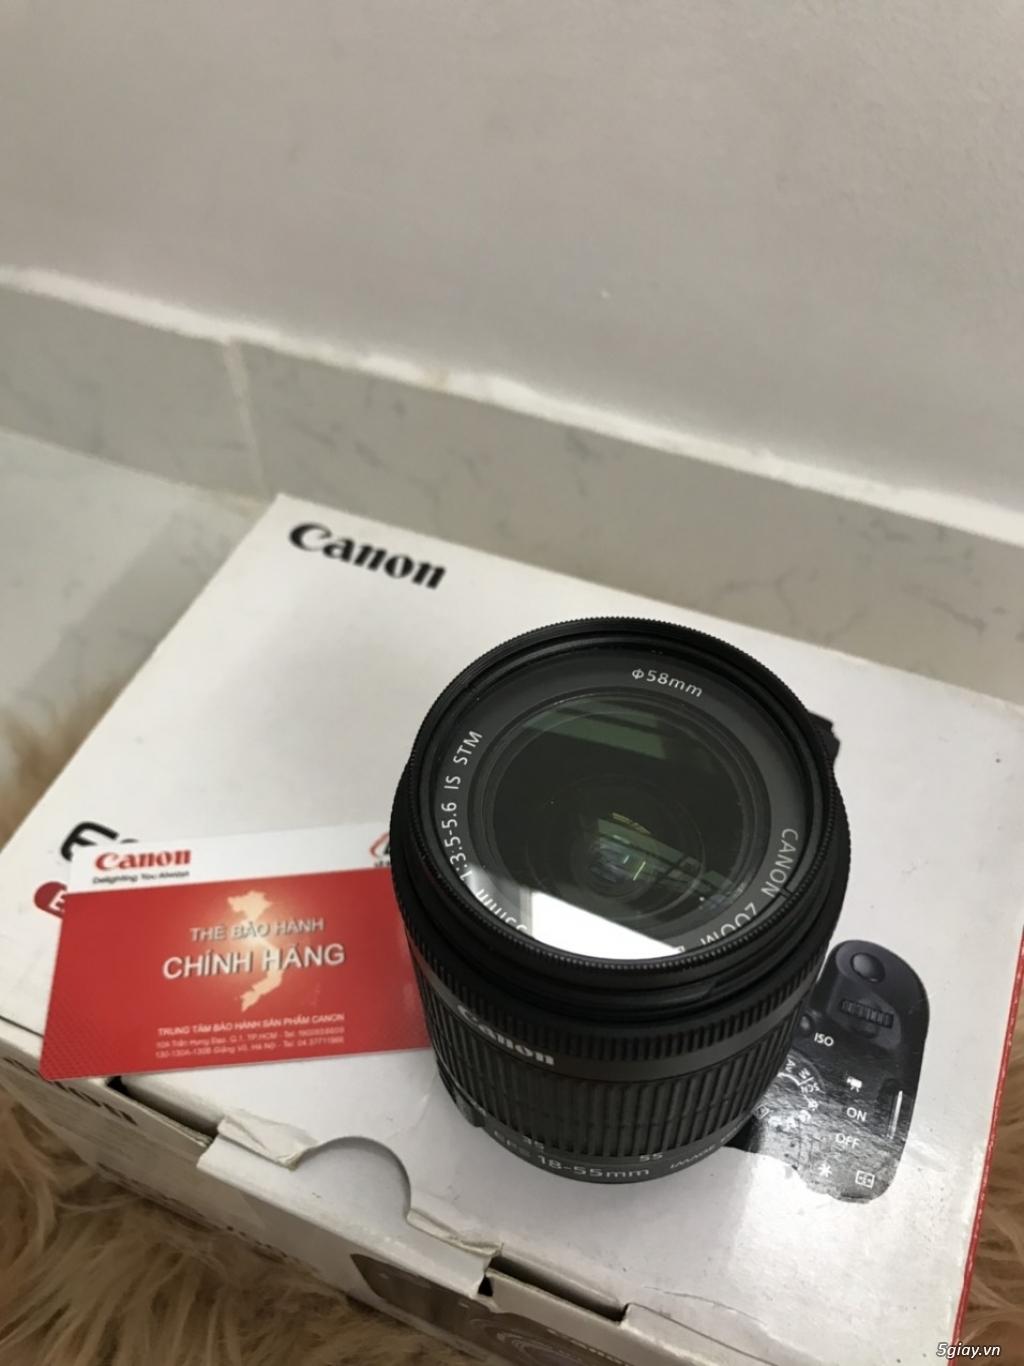 Cần bán Canon 700D + Lens kit 18-55 STM + Lens Tamron 24-135, full box - 4